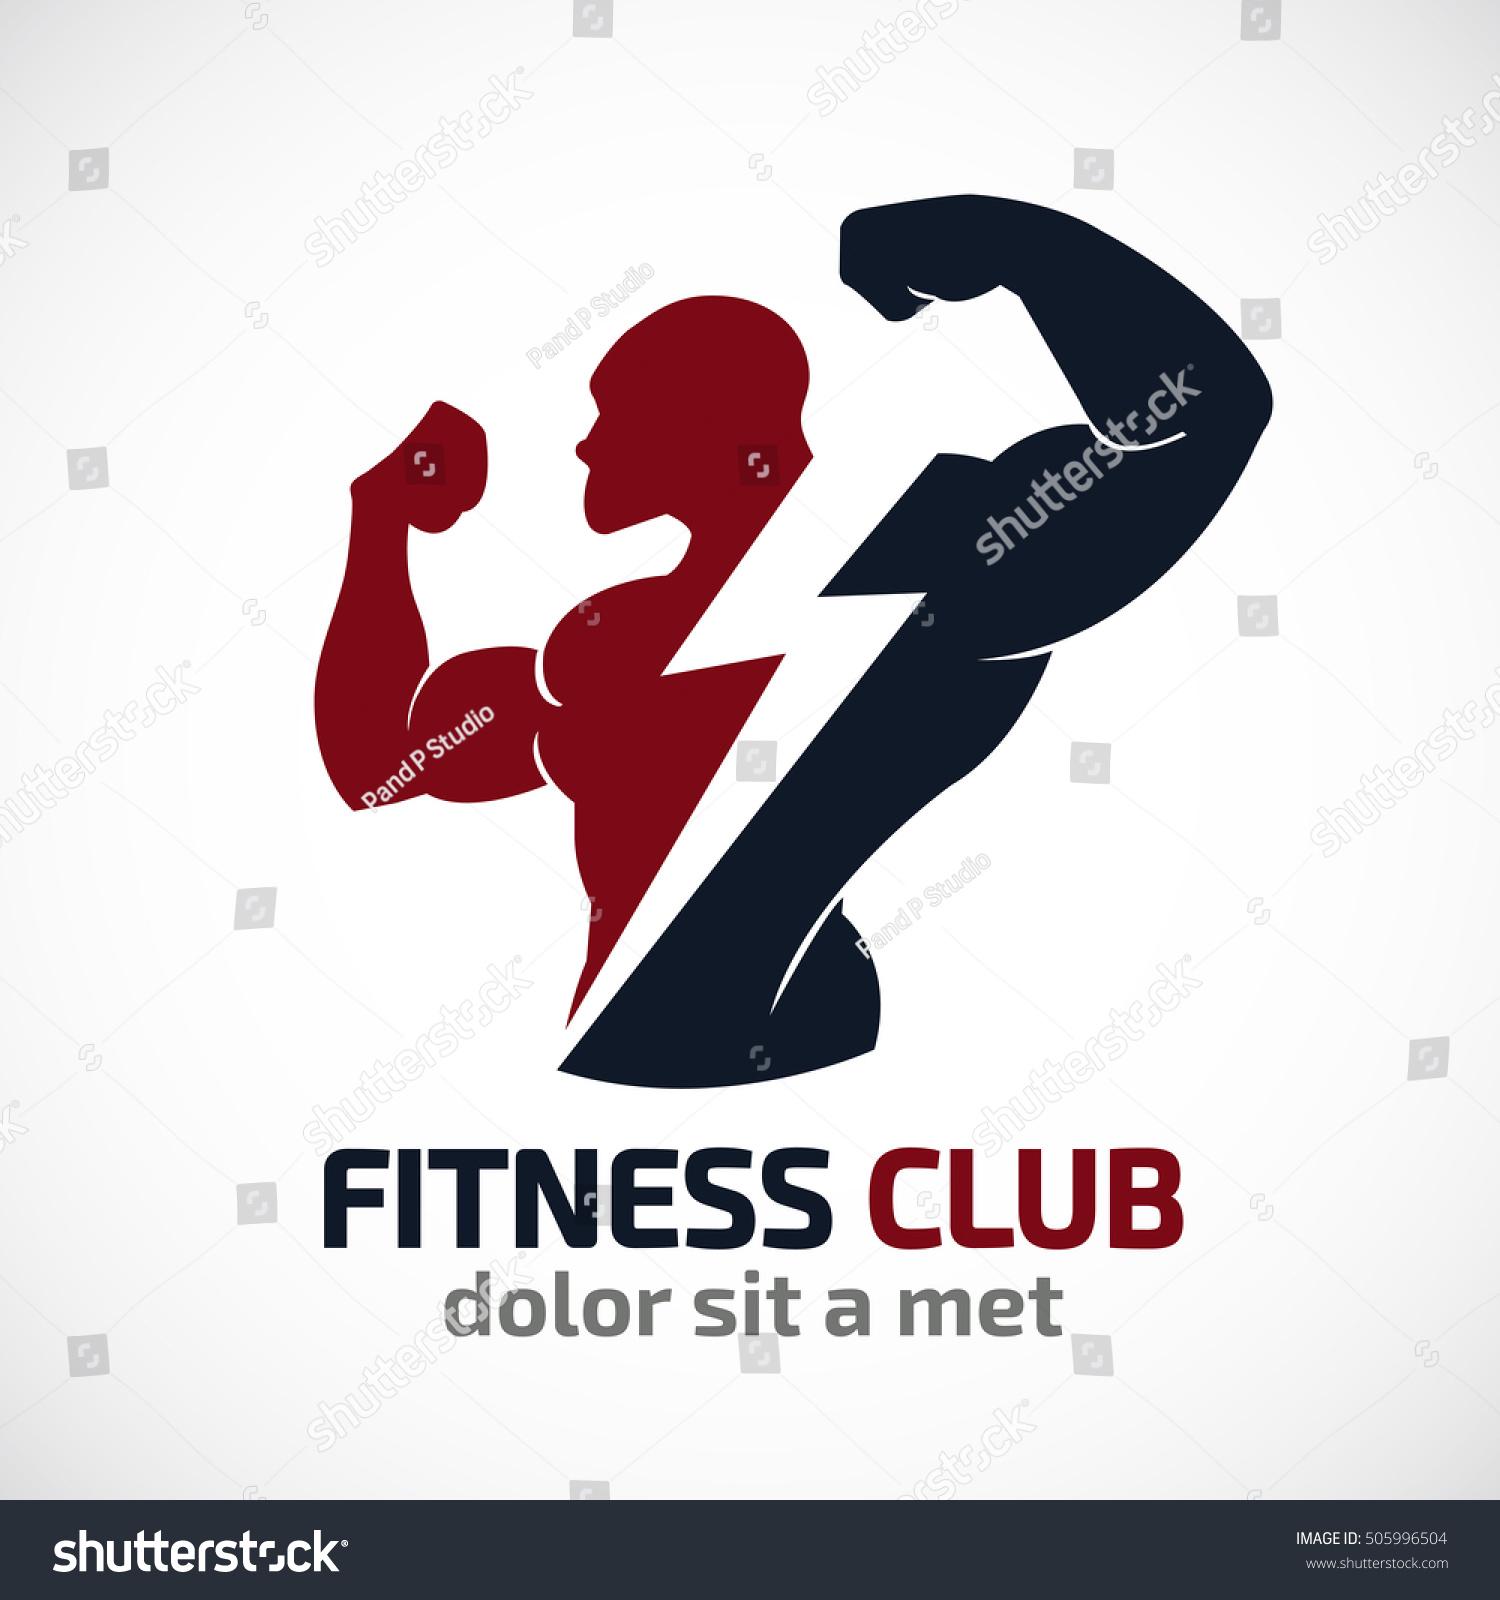 Fitness Vector Logo Design Templatedesign Gym Stock Vector ... for Fitness Logo Vector Free Download  165jwn